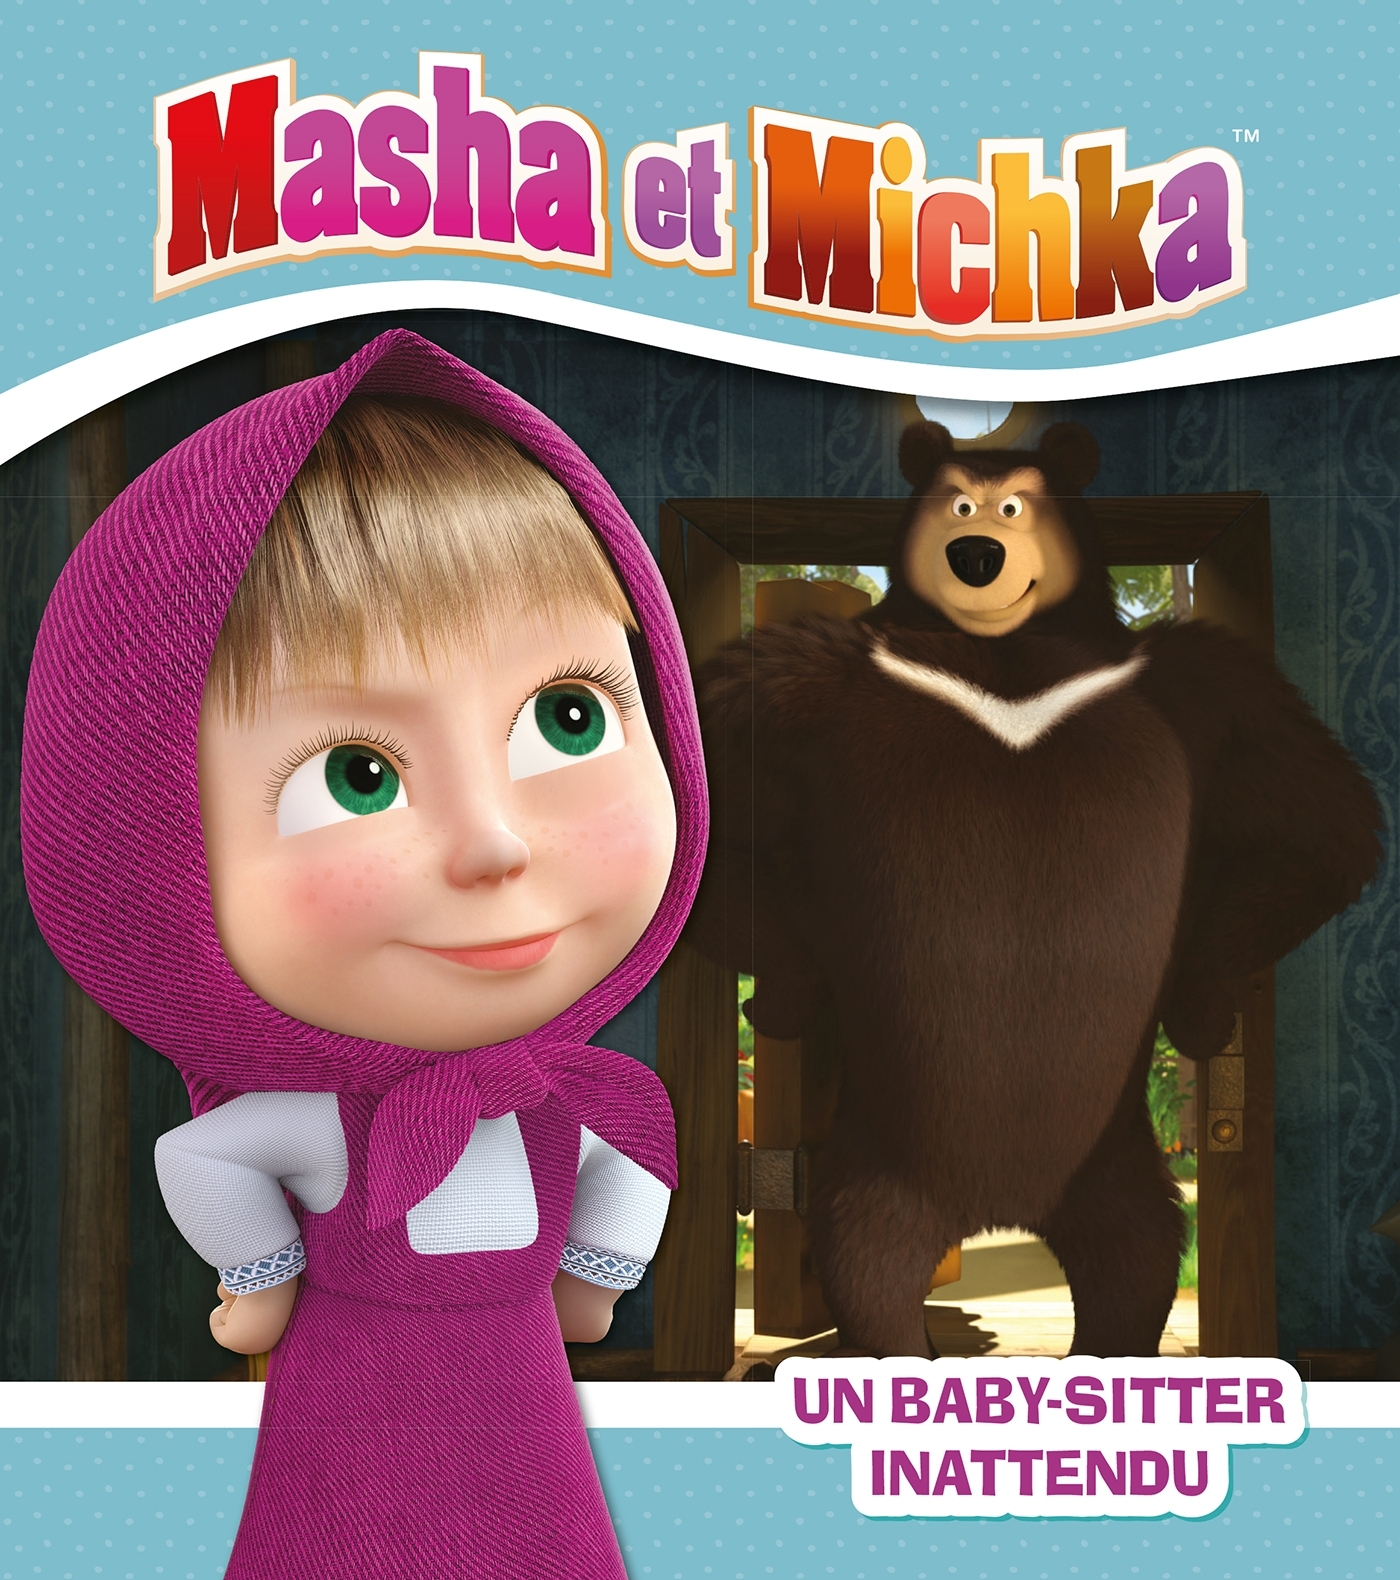 MASHA ET MICHKA - UN BABY-SITTER INATTENDU